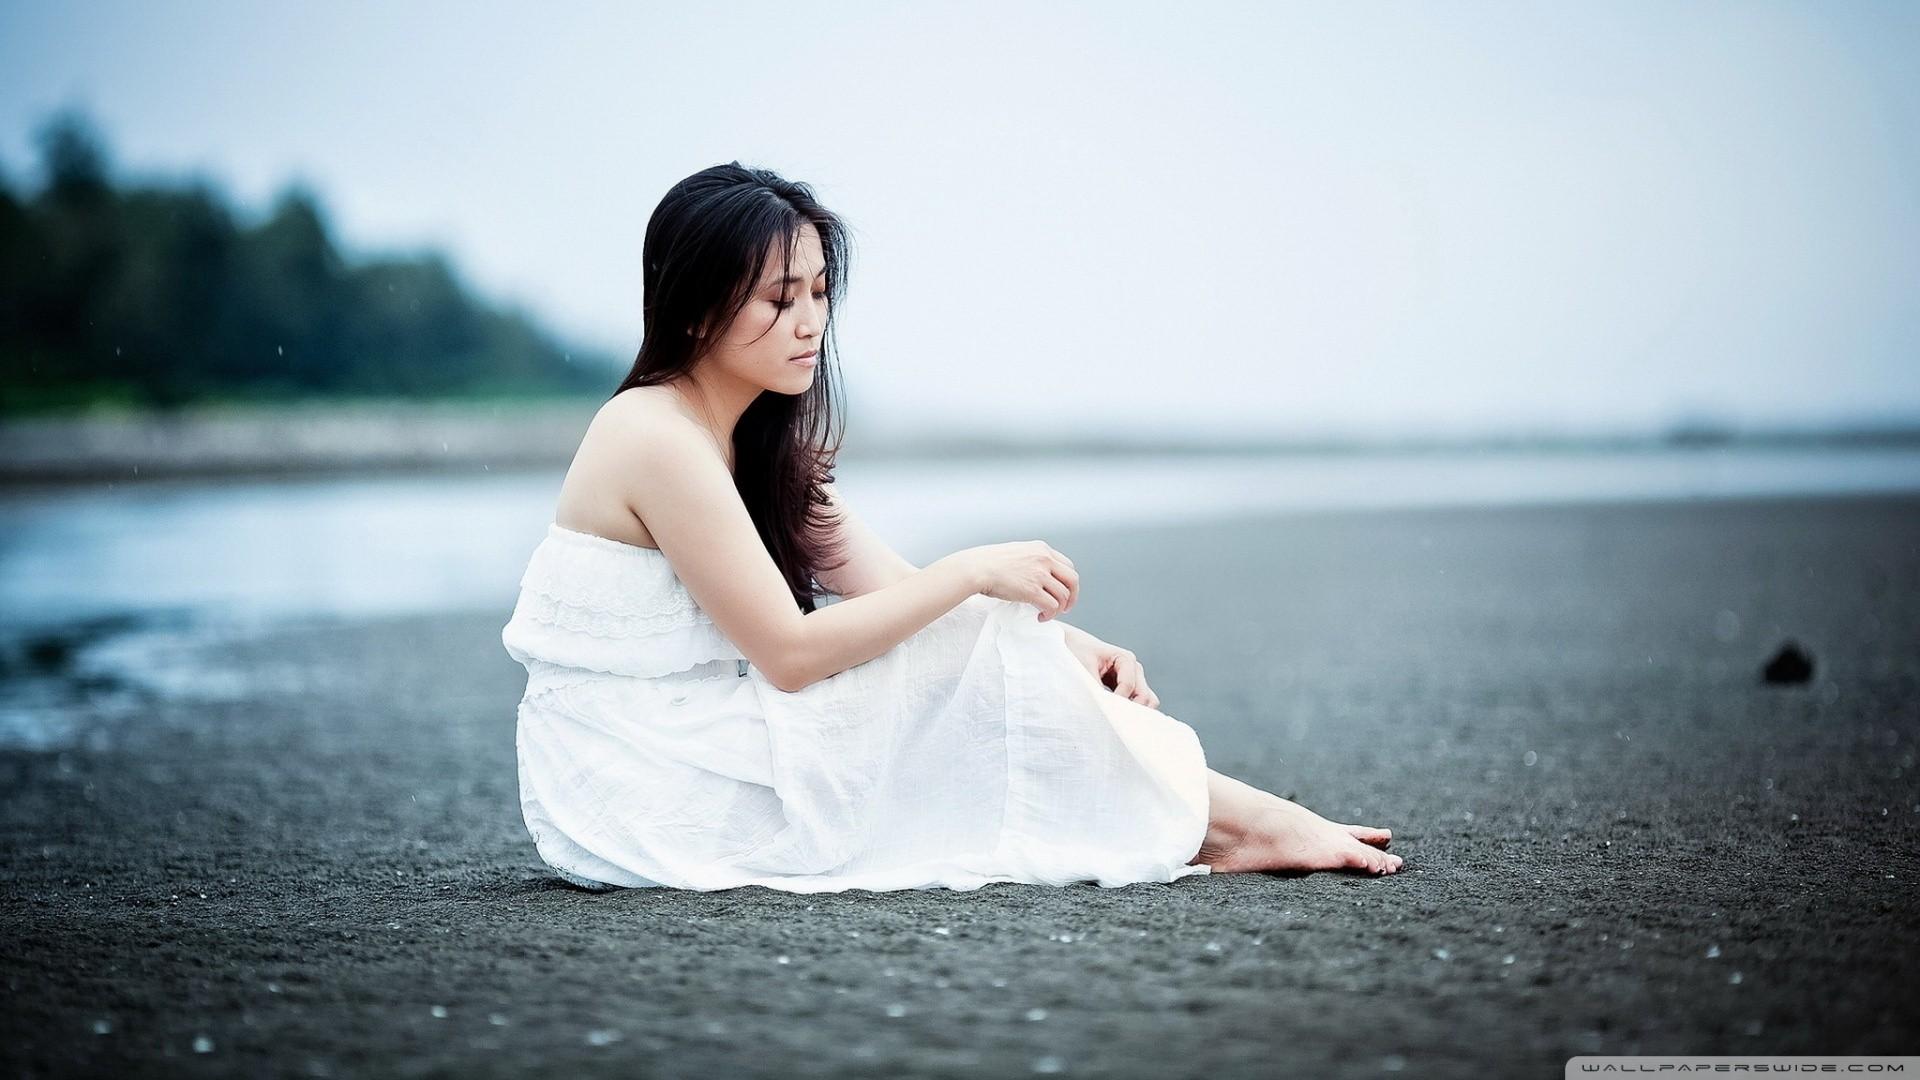 Fondos de pantalla : mujer, modelo, morena, asiático, fotografía ...